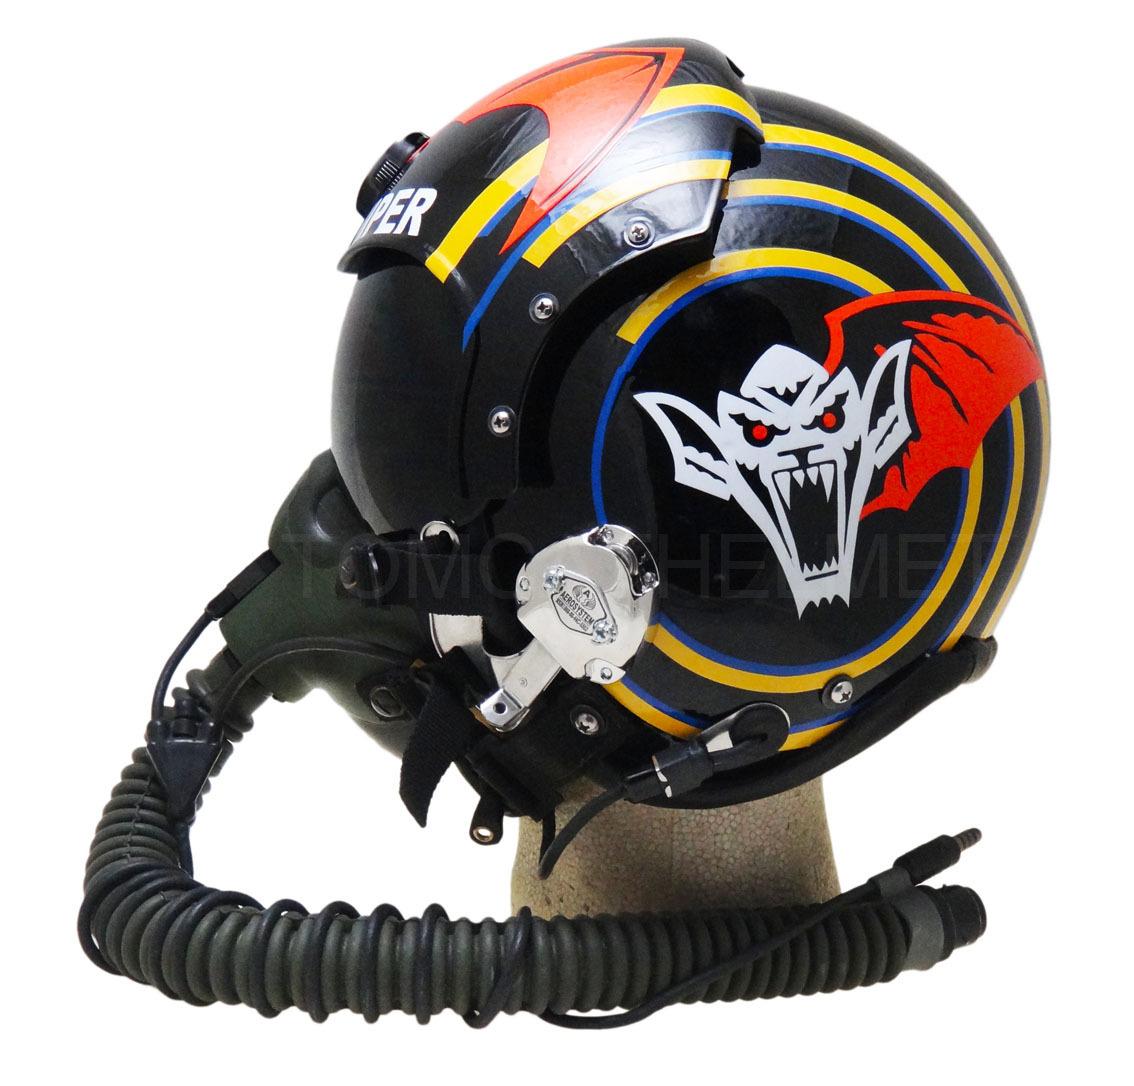 Top Gun Viper Helmet Wwwtopsimagescom